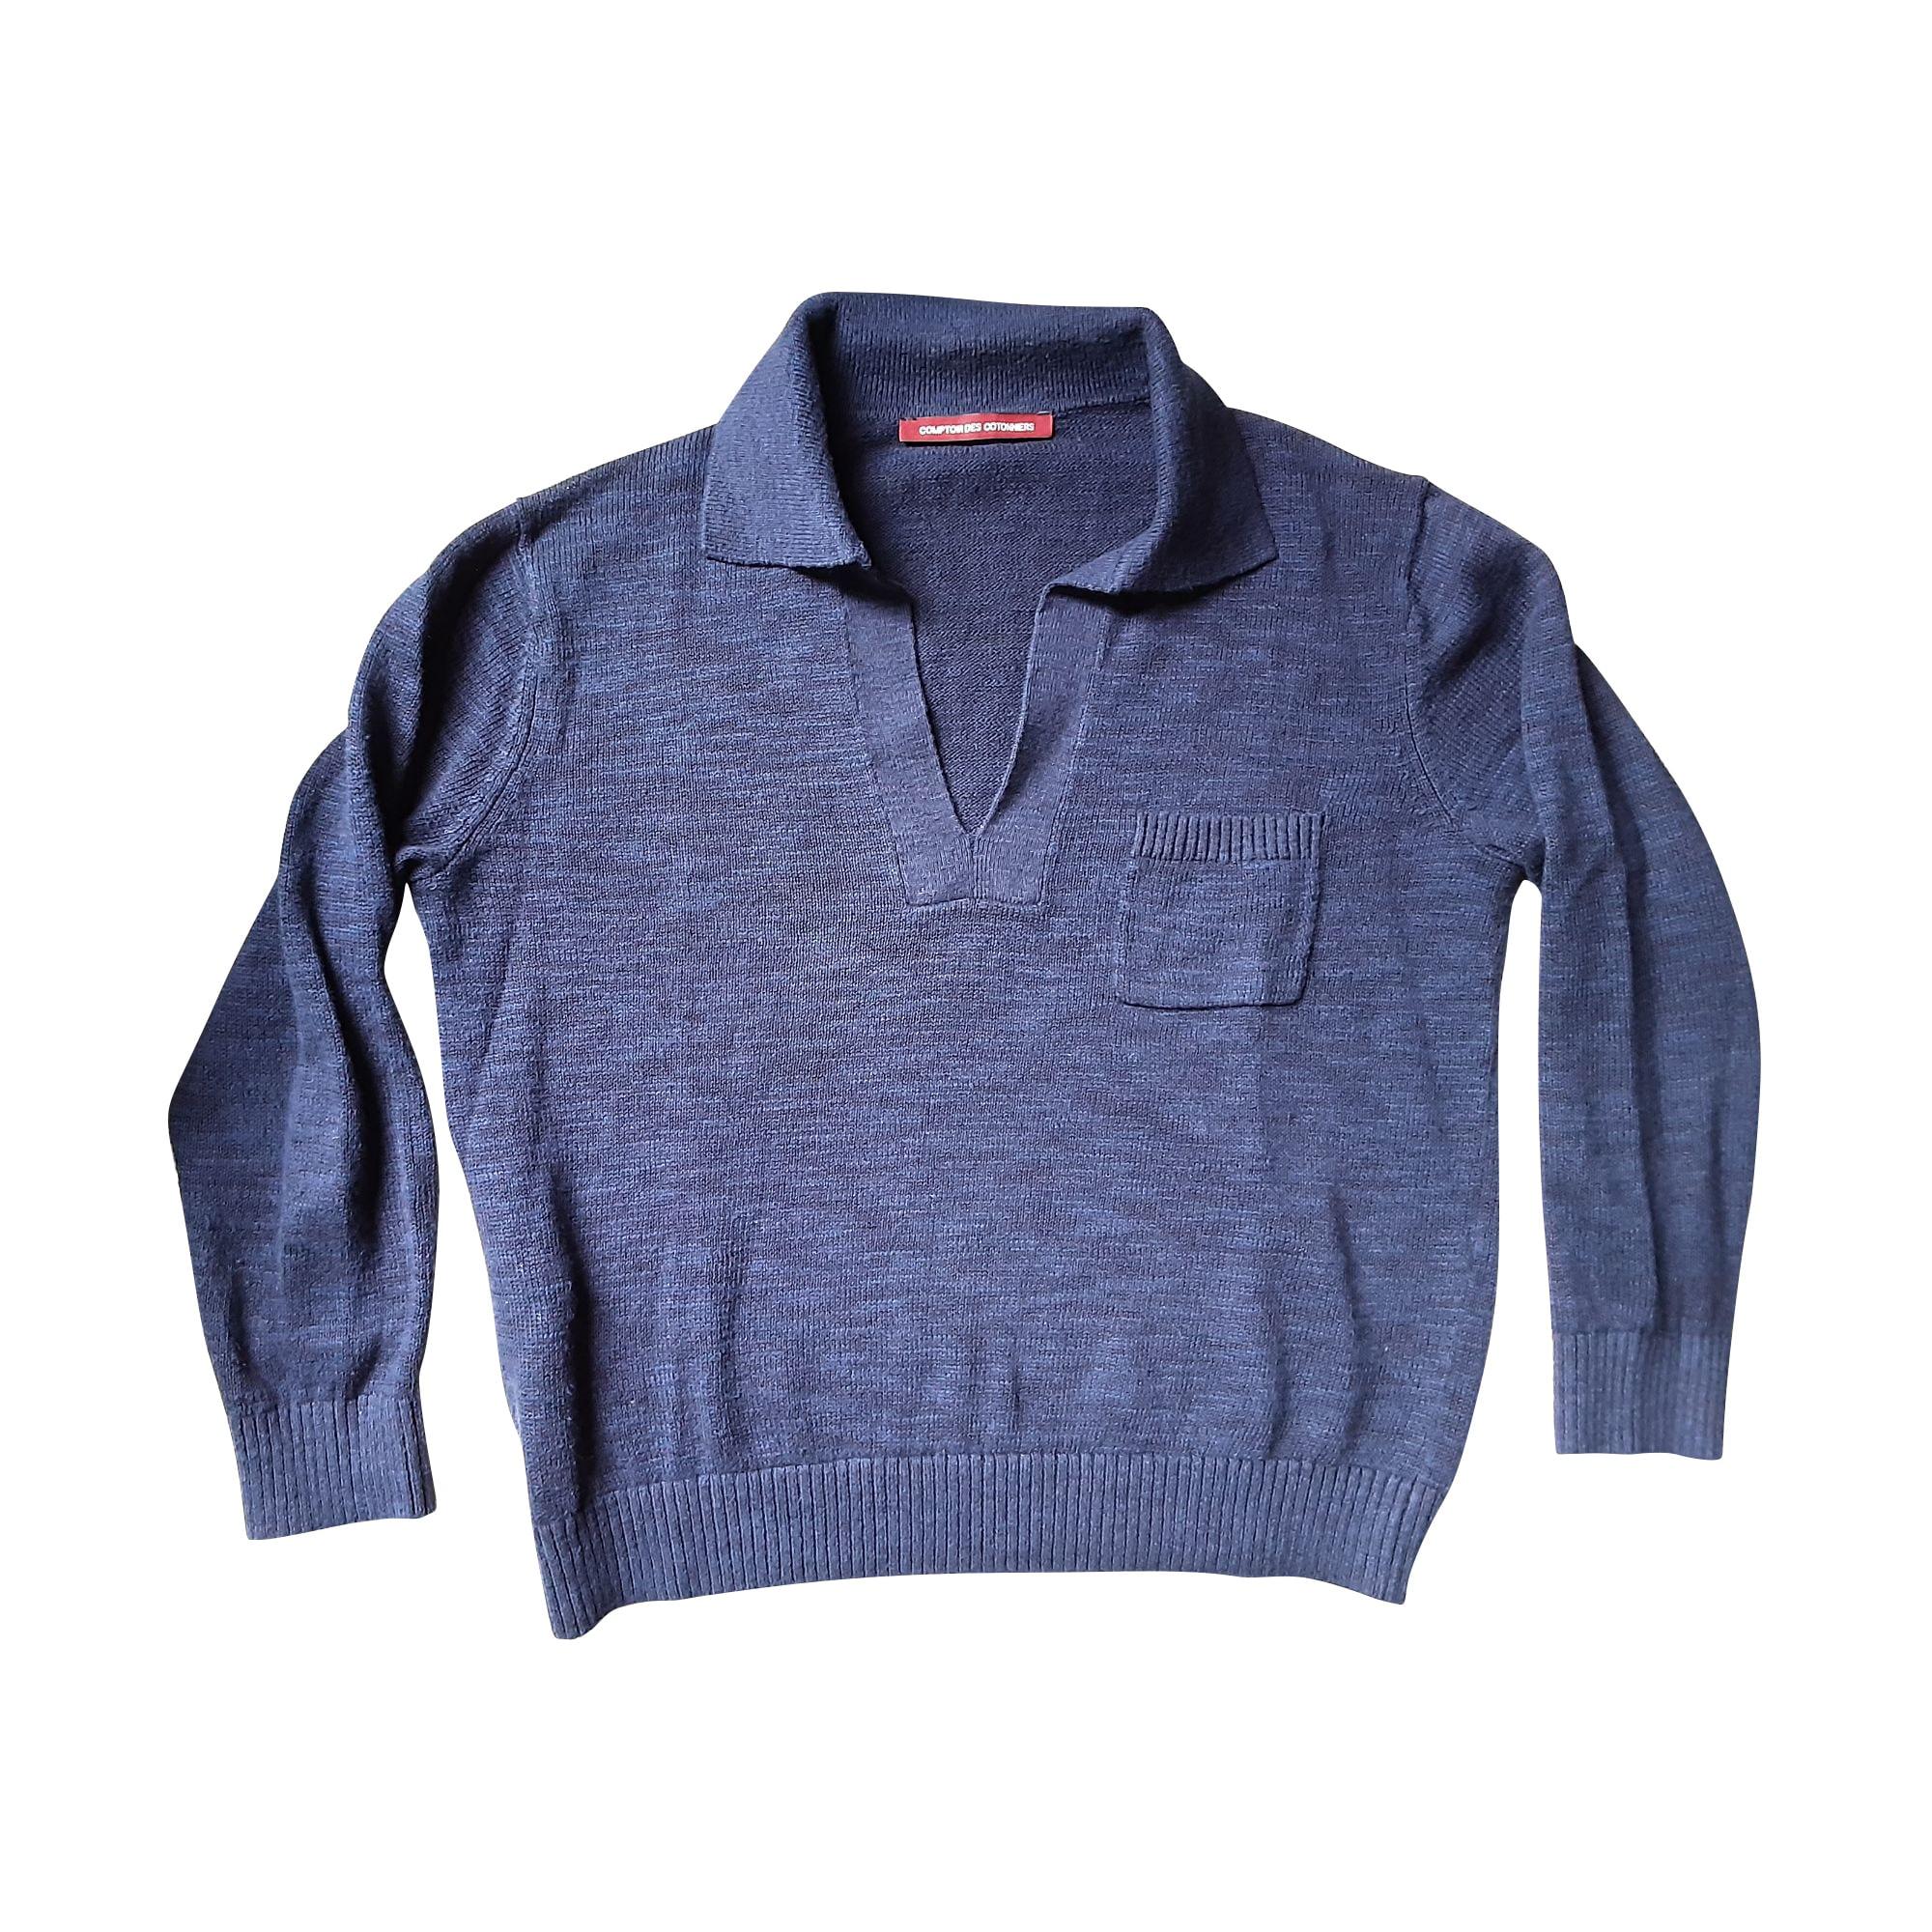 Pull COMPTOIR DES COTONNIERS Bleu, bleu marine, bleu turquoise